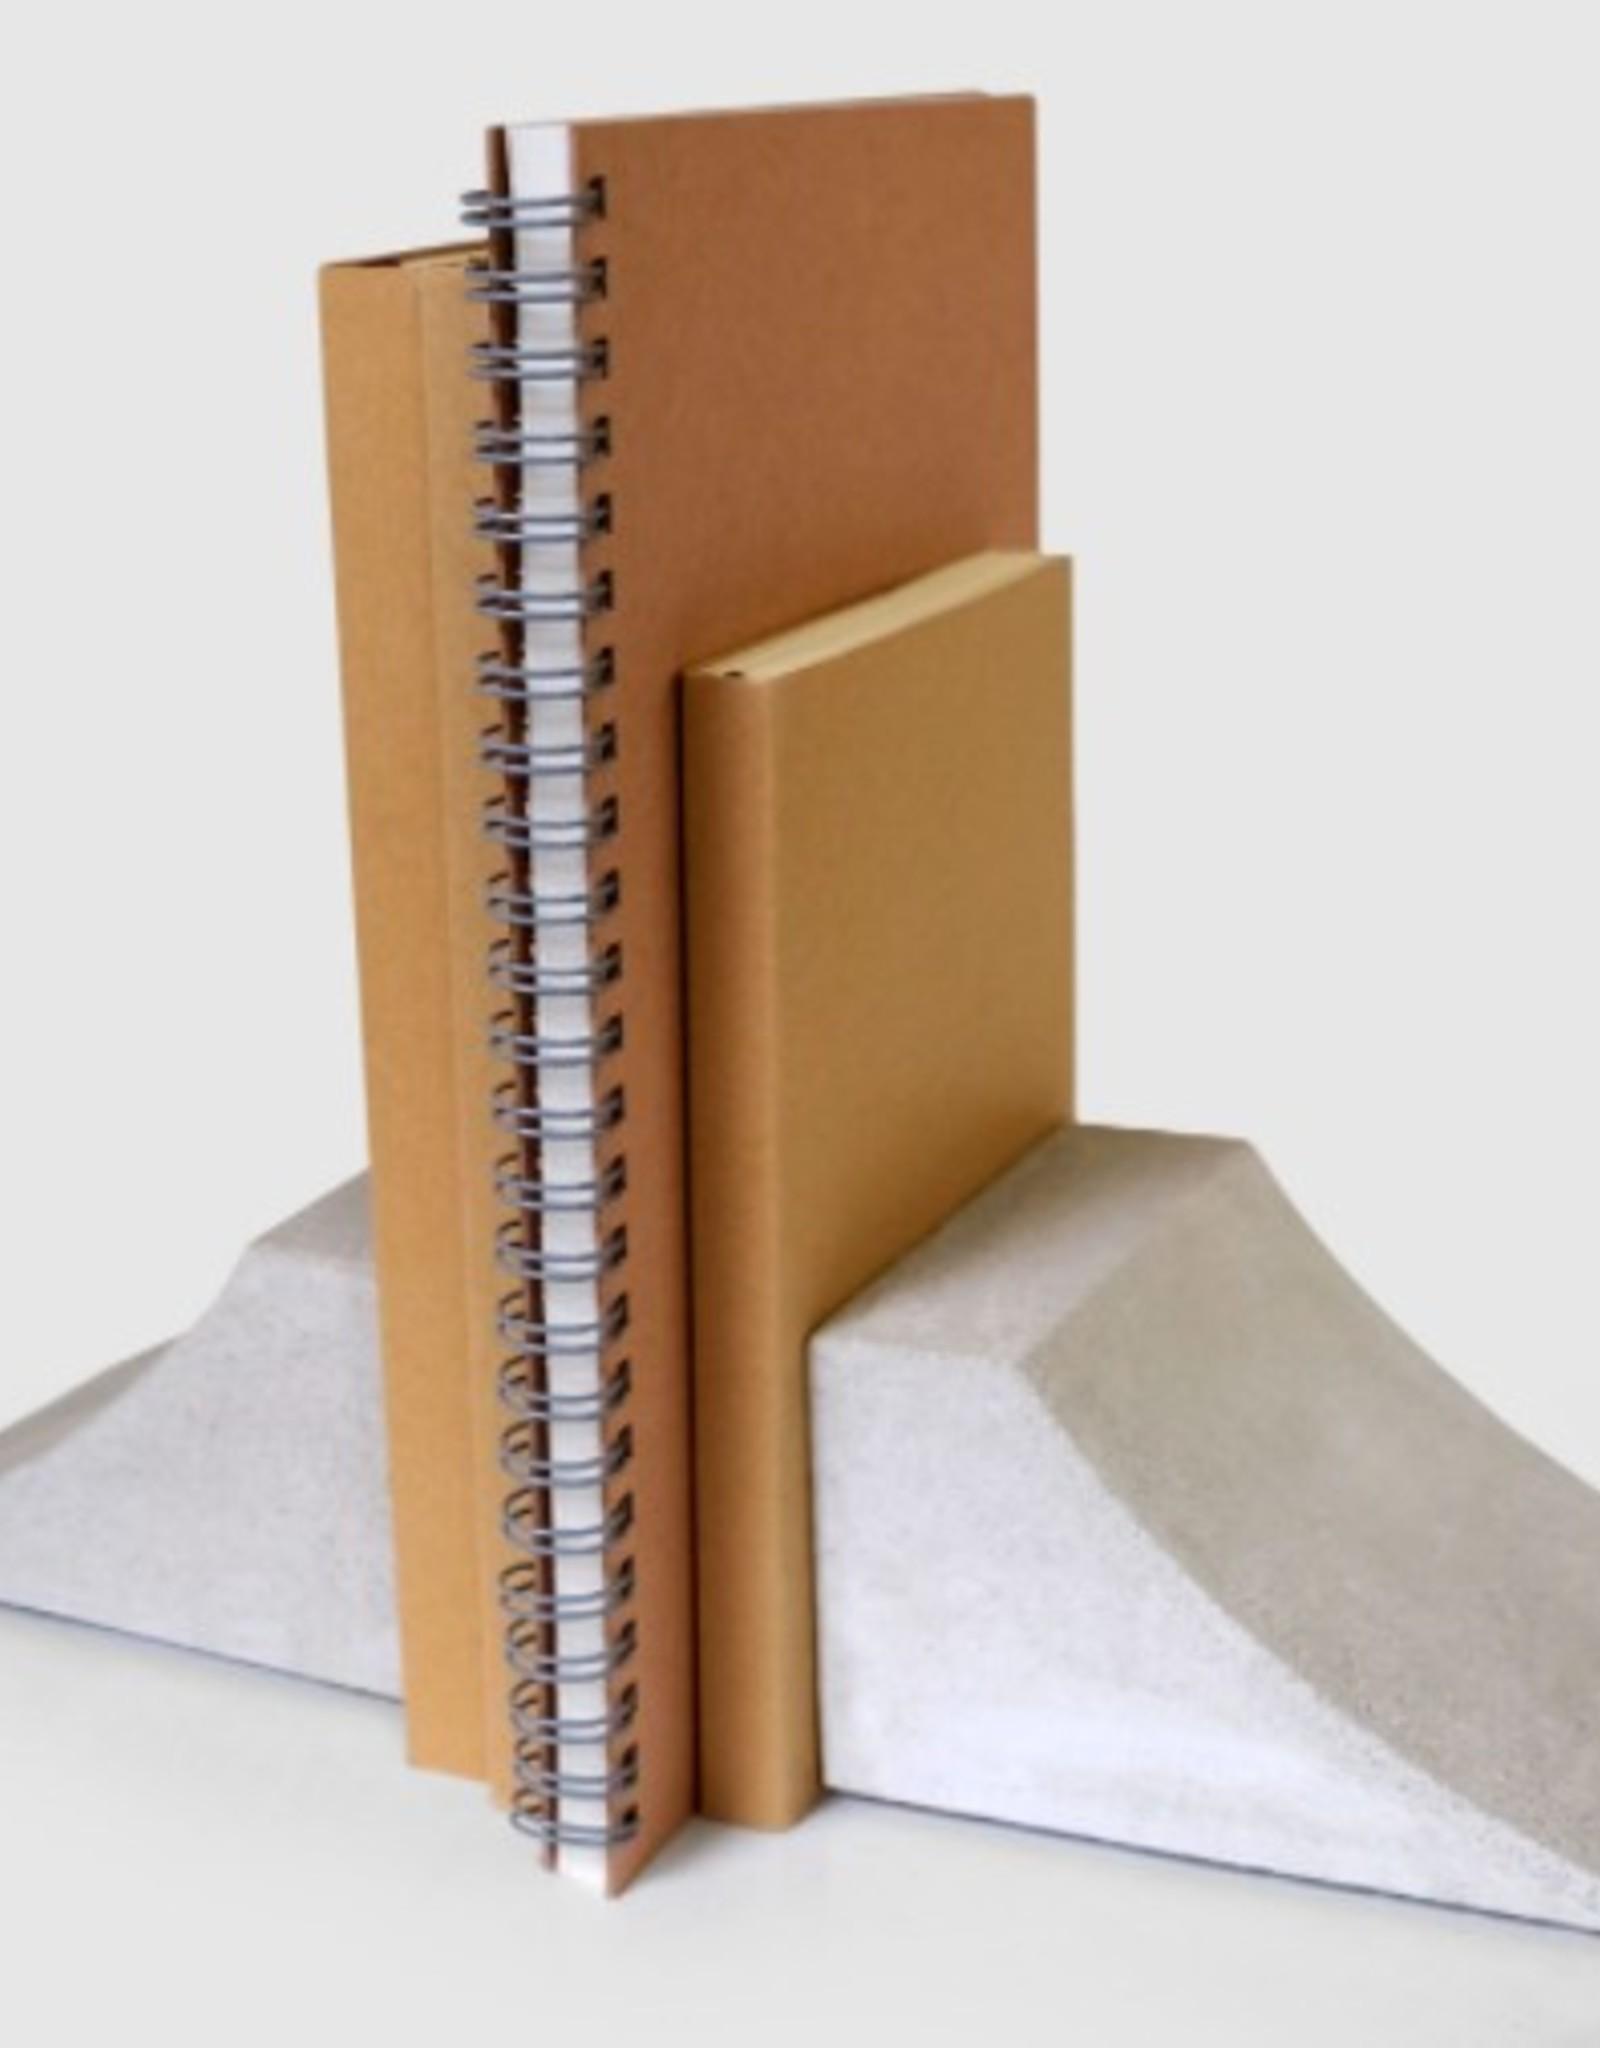 I LOVE HANDLES Book Launch concrete book ends